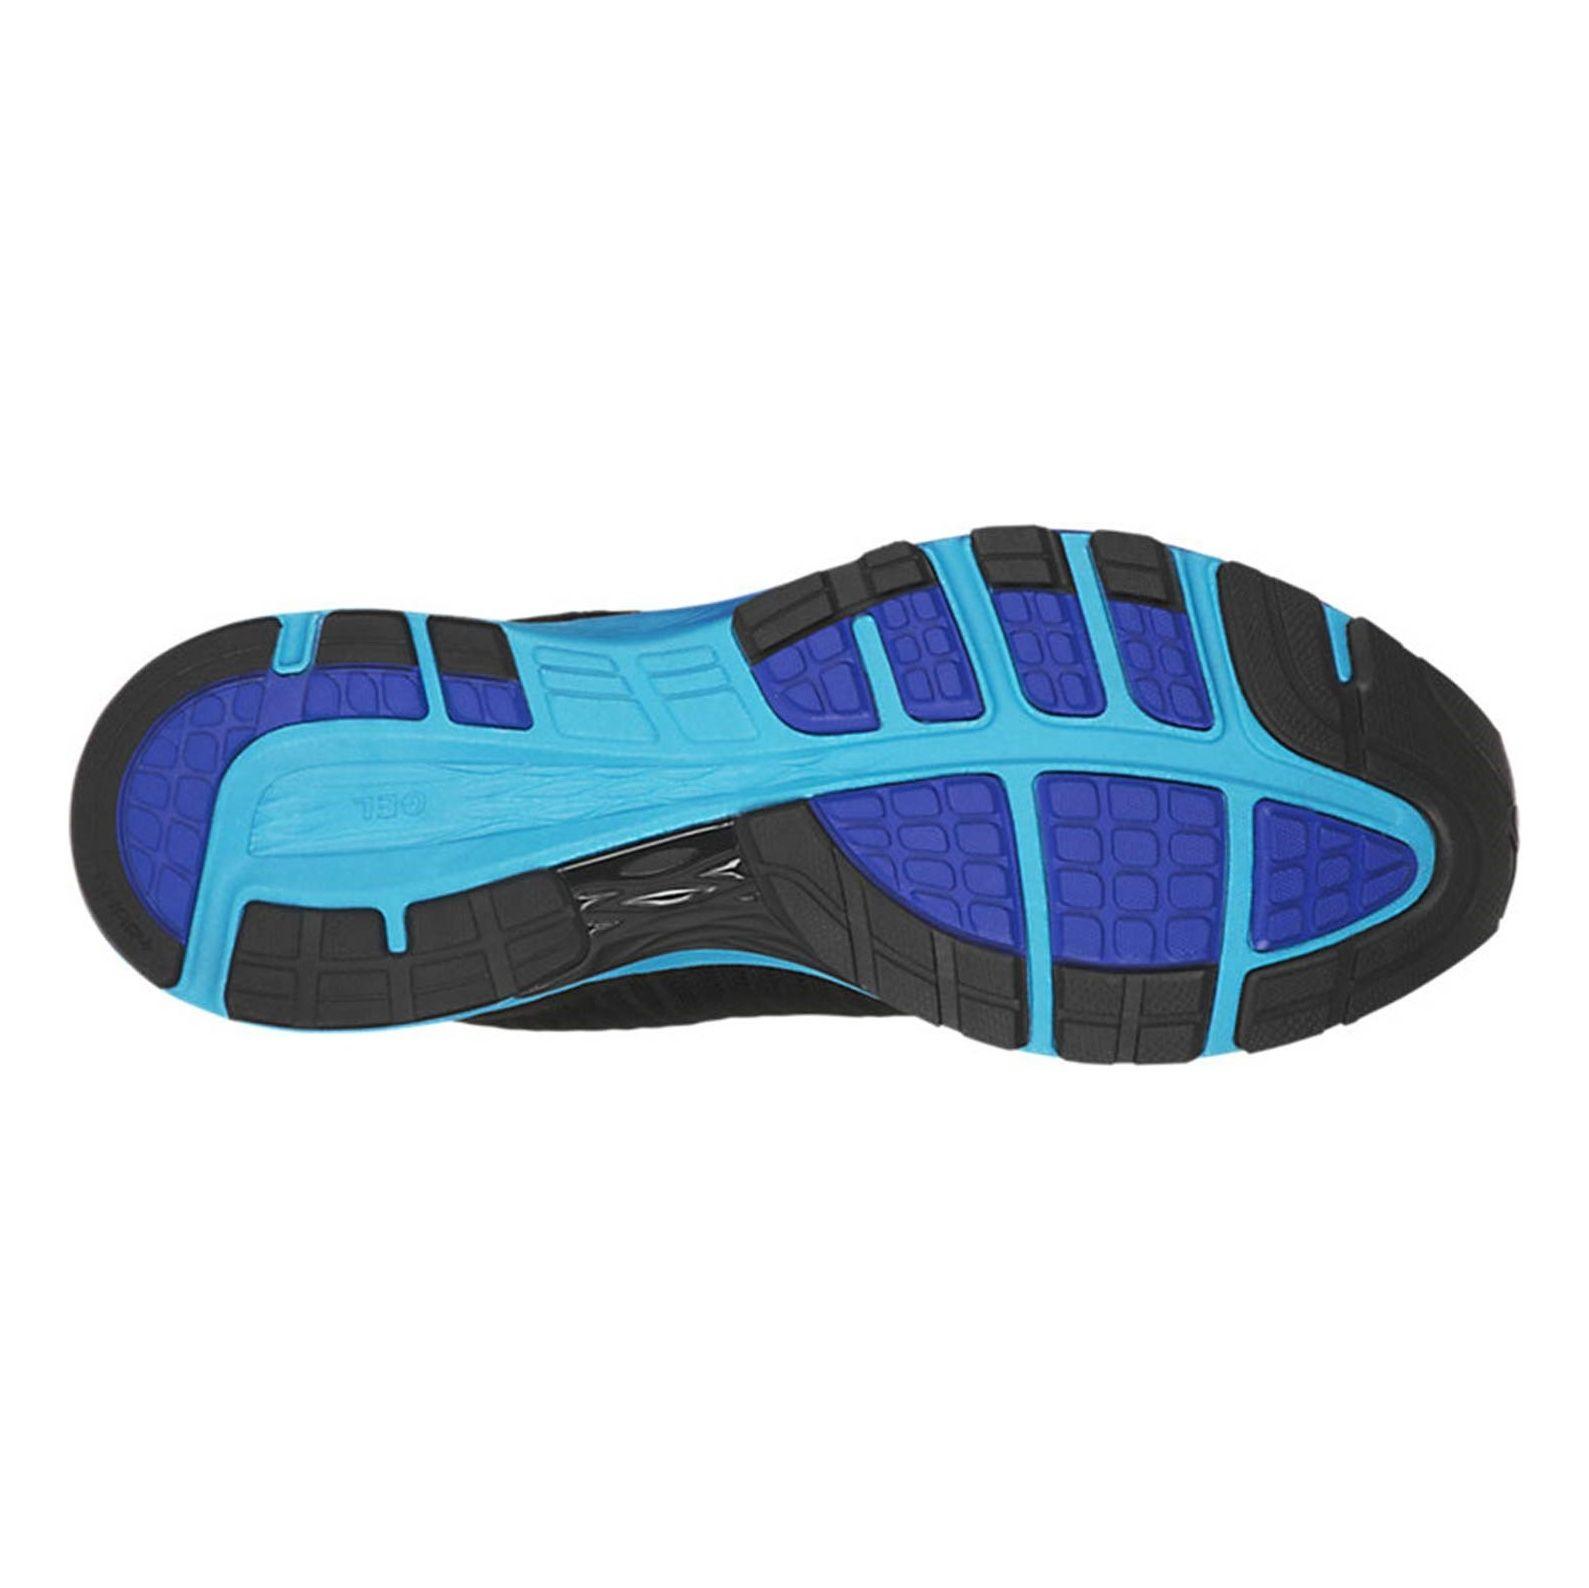 کفش دویدن بندی مردانه DynaFlyte 2 - اسیکس - مشکی - 3